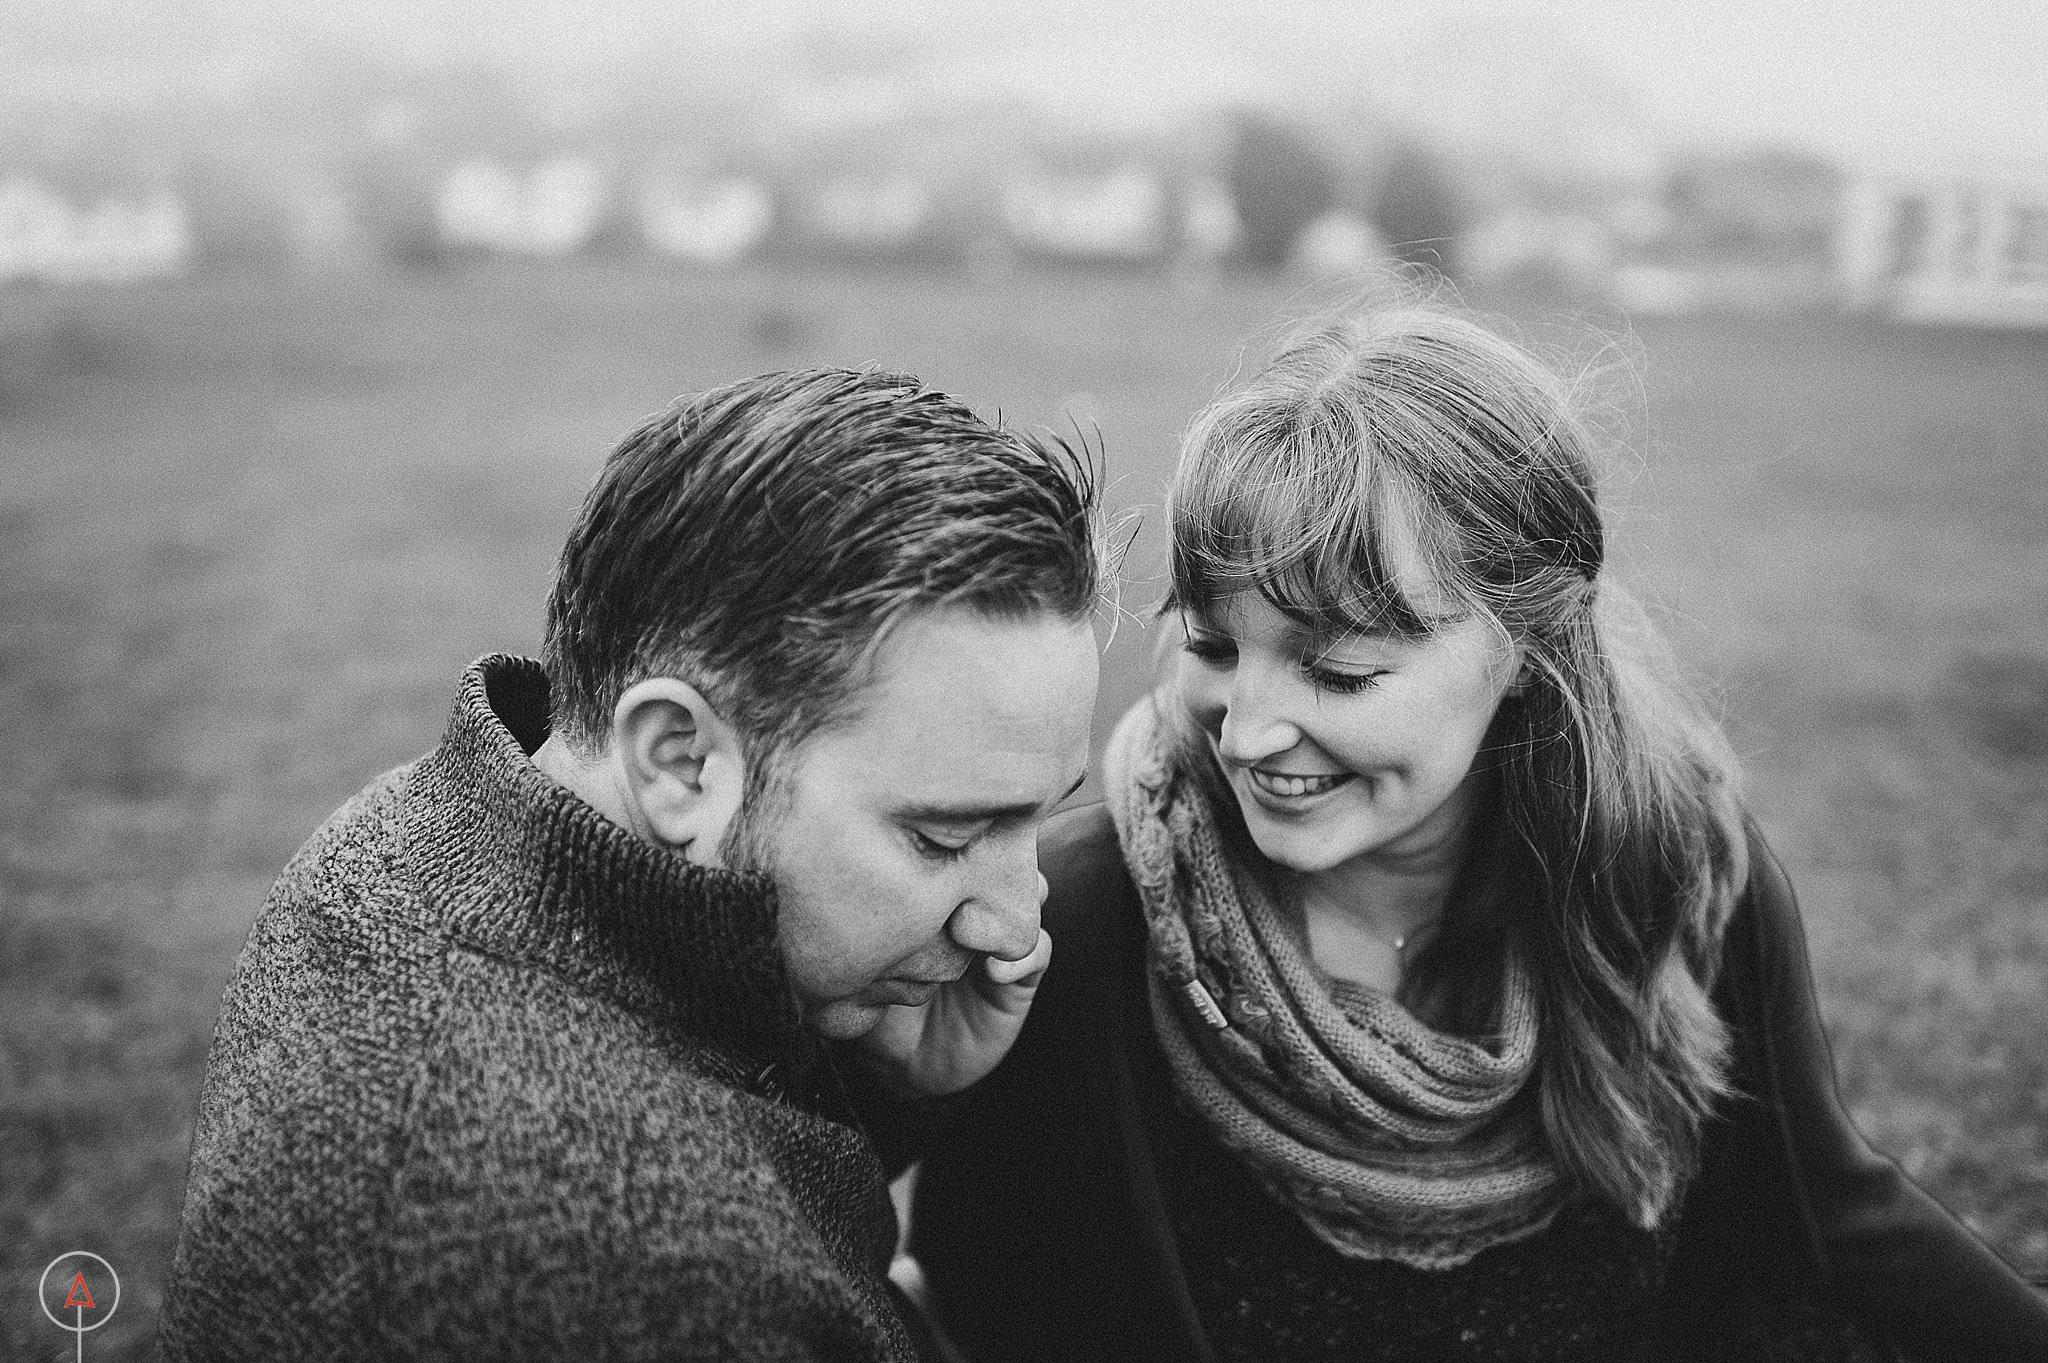 South-Wales-Pre-Wedding-Photography-Aga-Tomaszek-00021